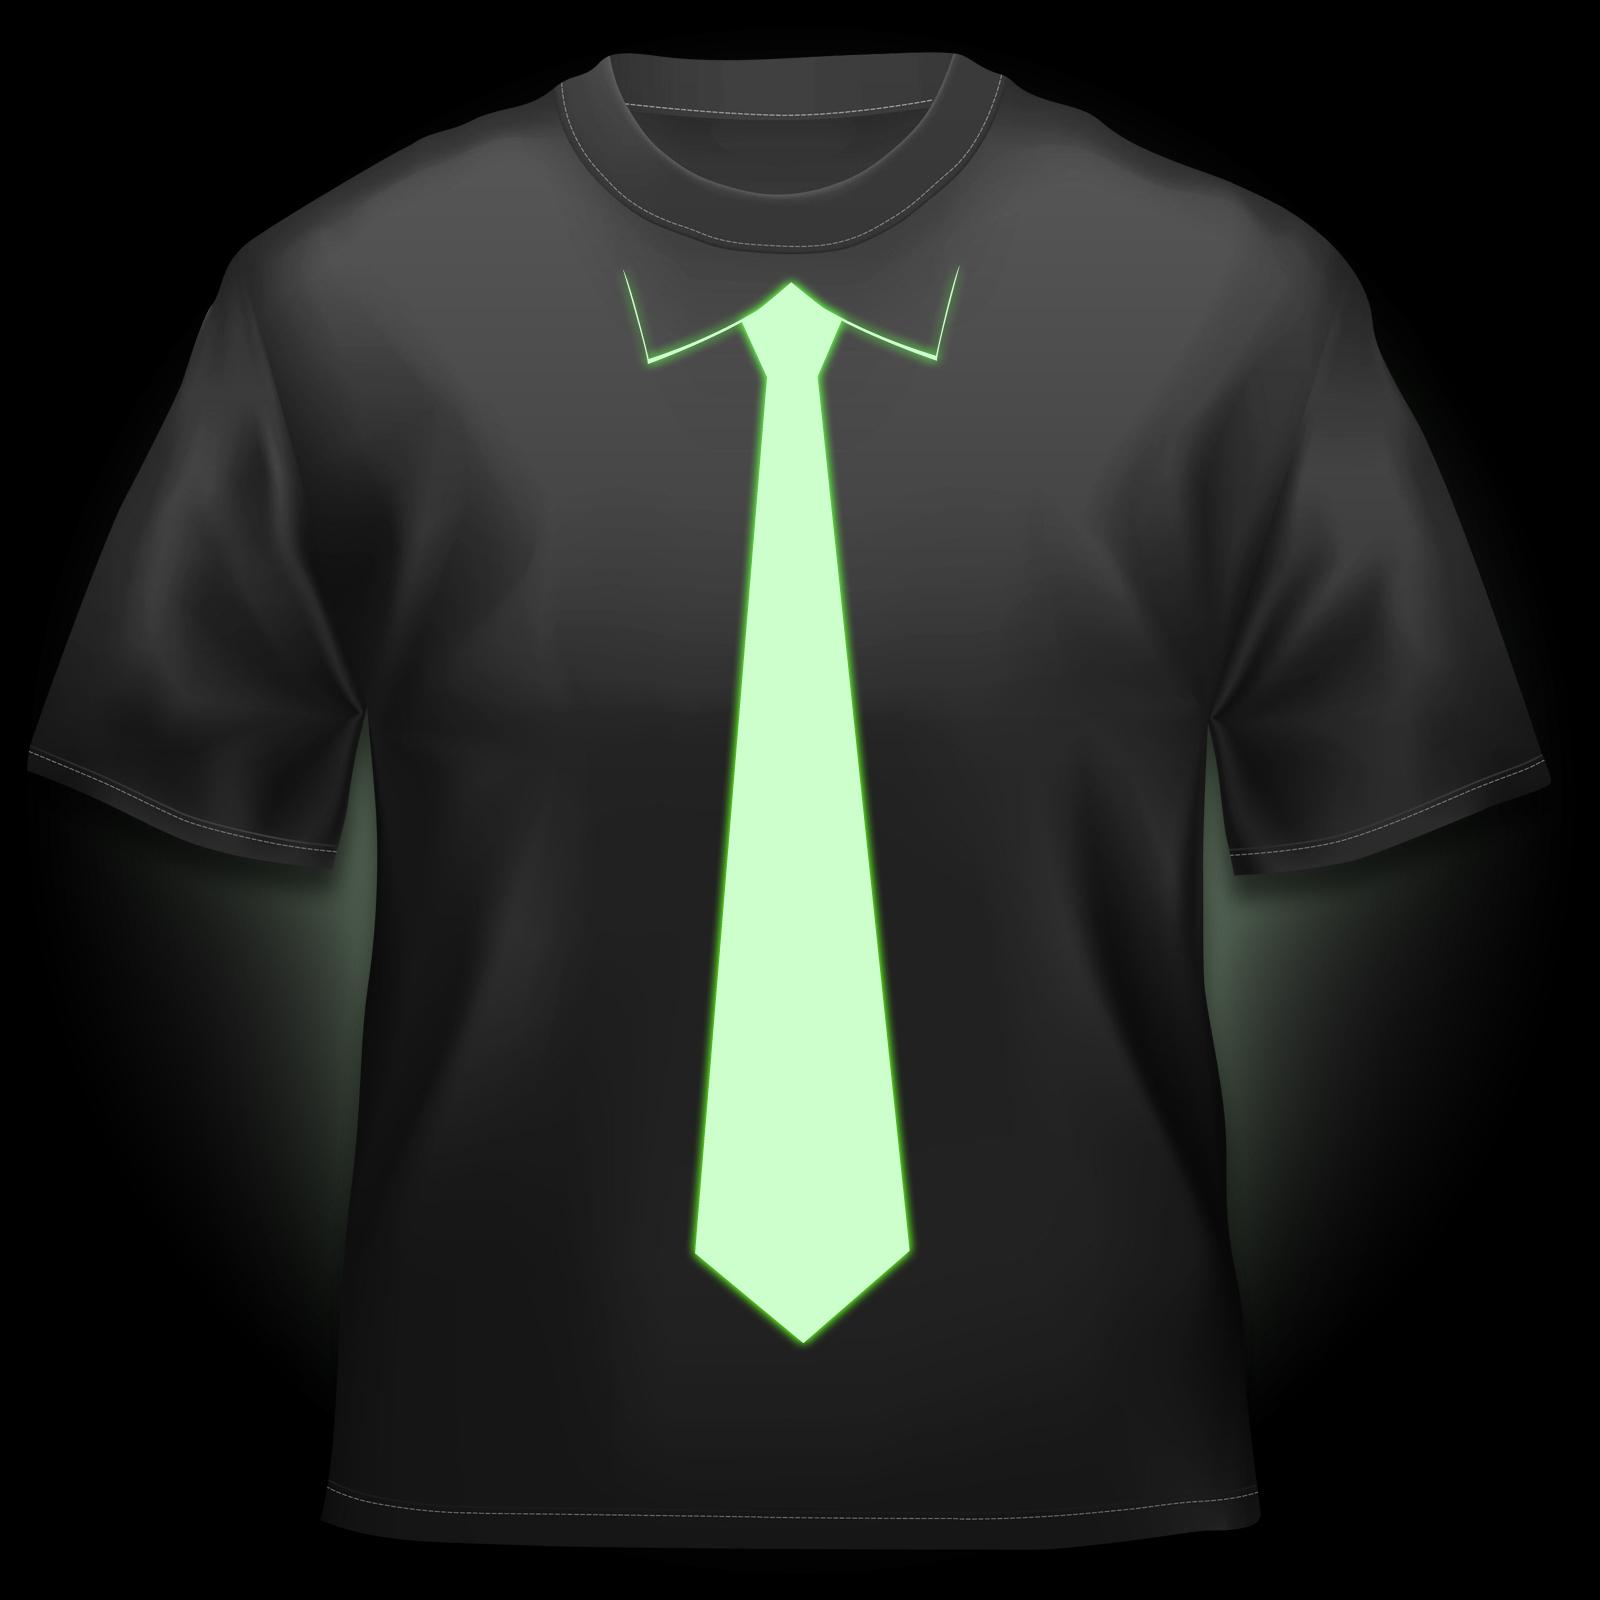 Glow Tie Tshirt